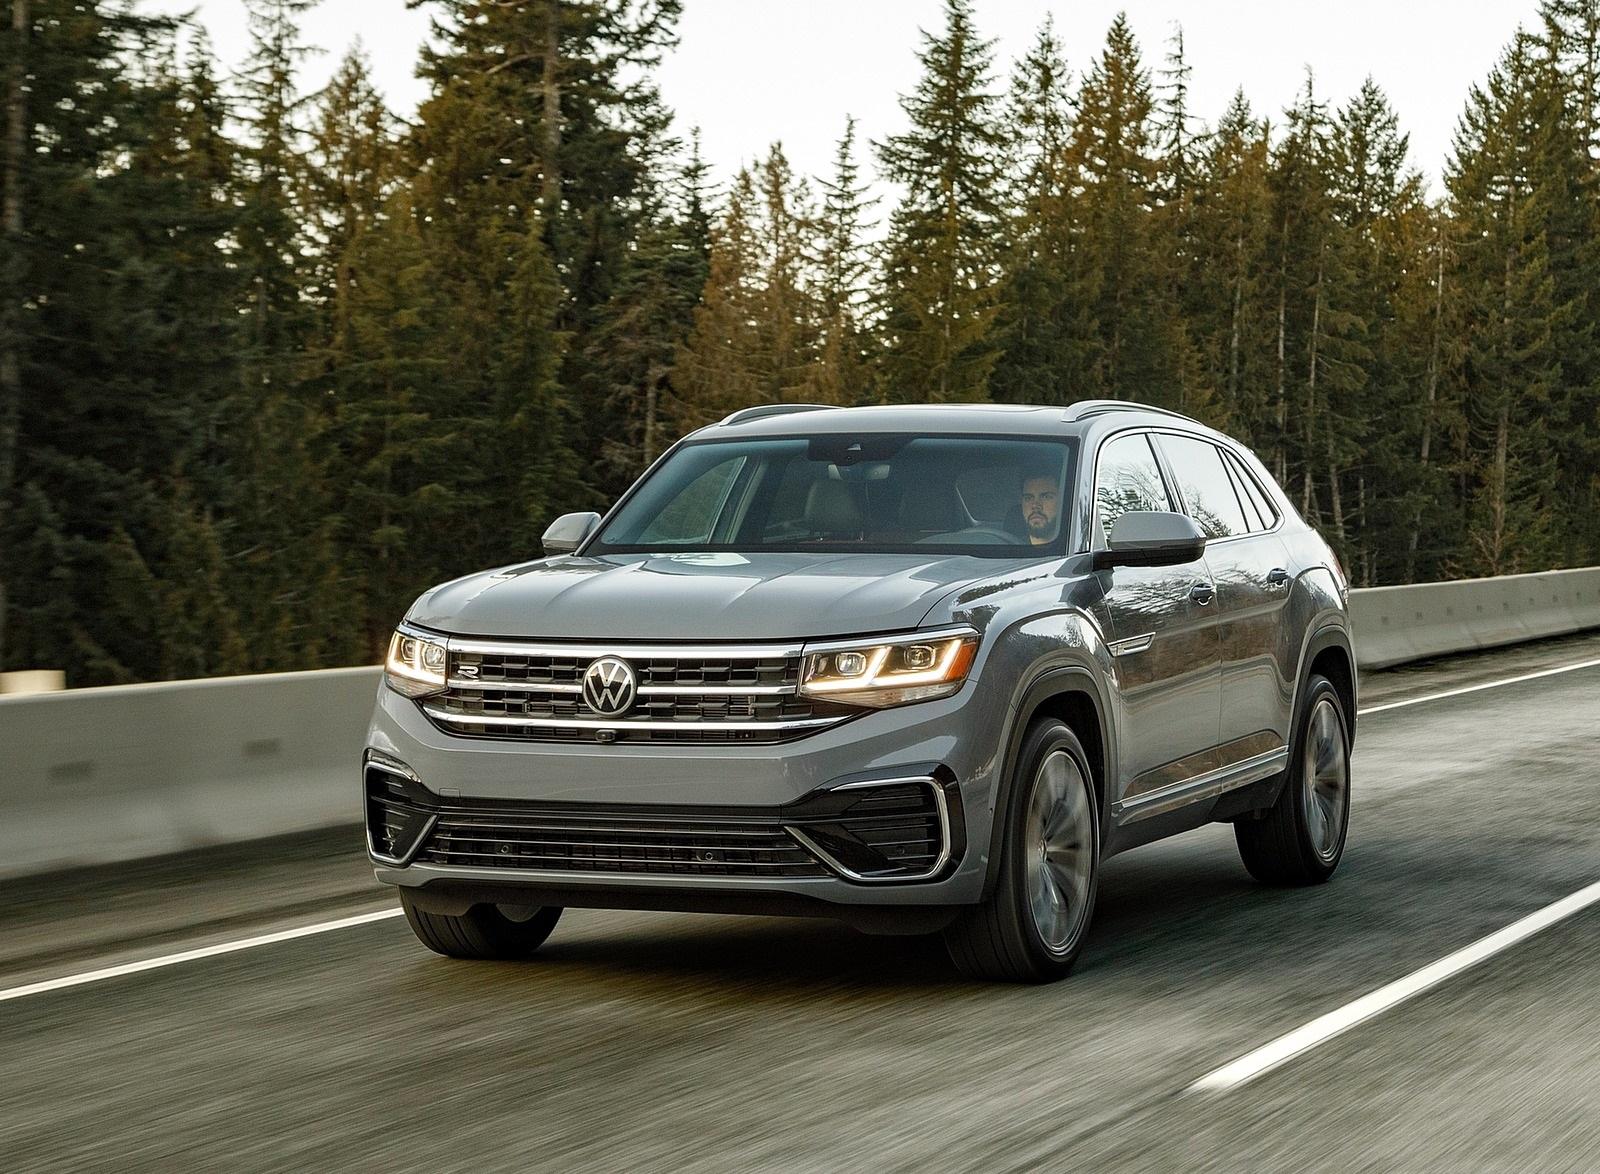 2020 Volkswagen Atlas Cross Sport SEL Premium R Line (Color: Pure Gray) Front Three-Quarter Wallpapers (3)